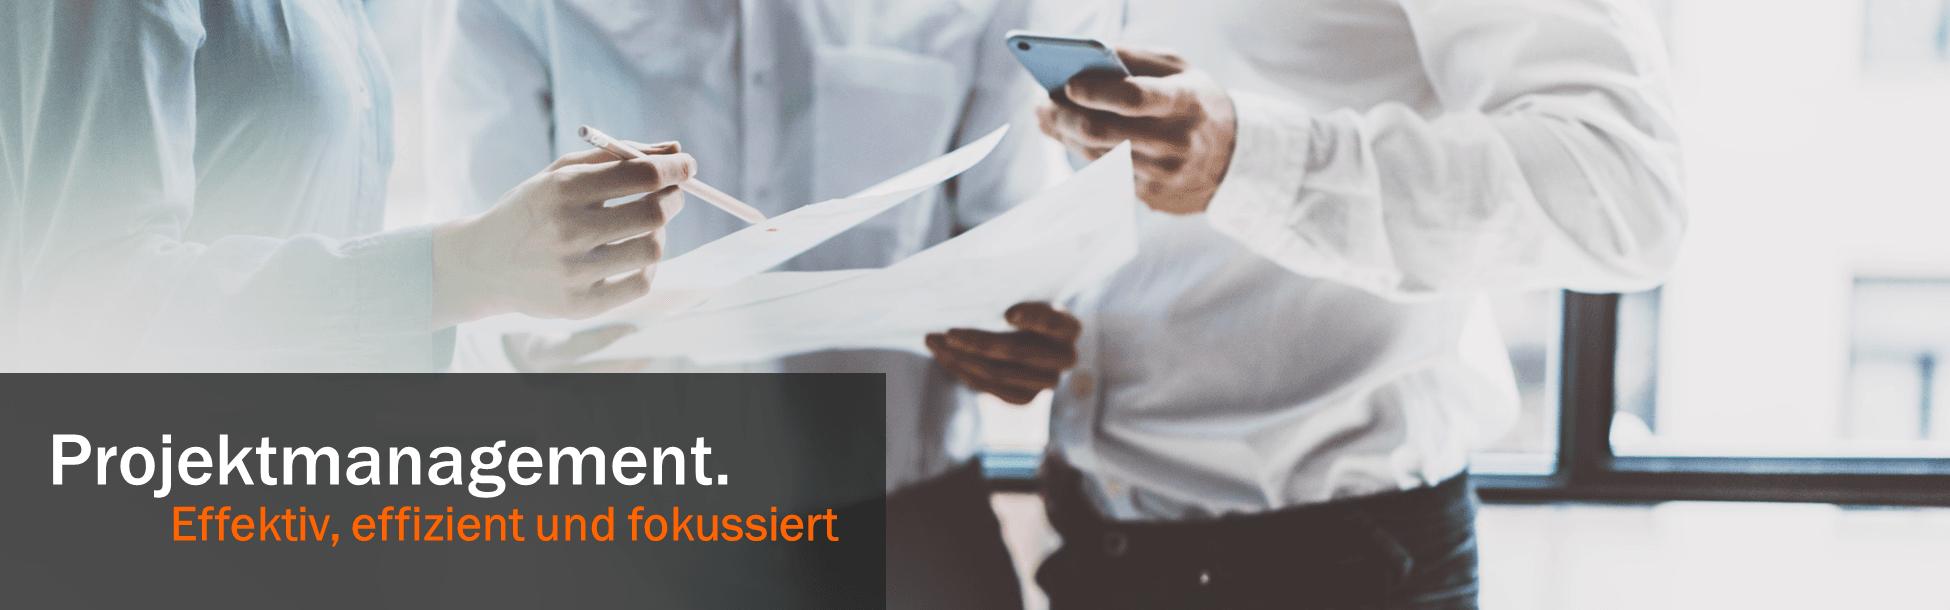 Projektmanagement_Slider